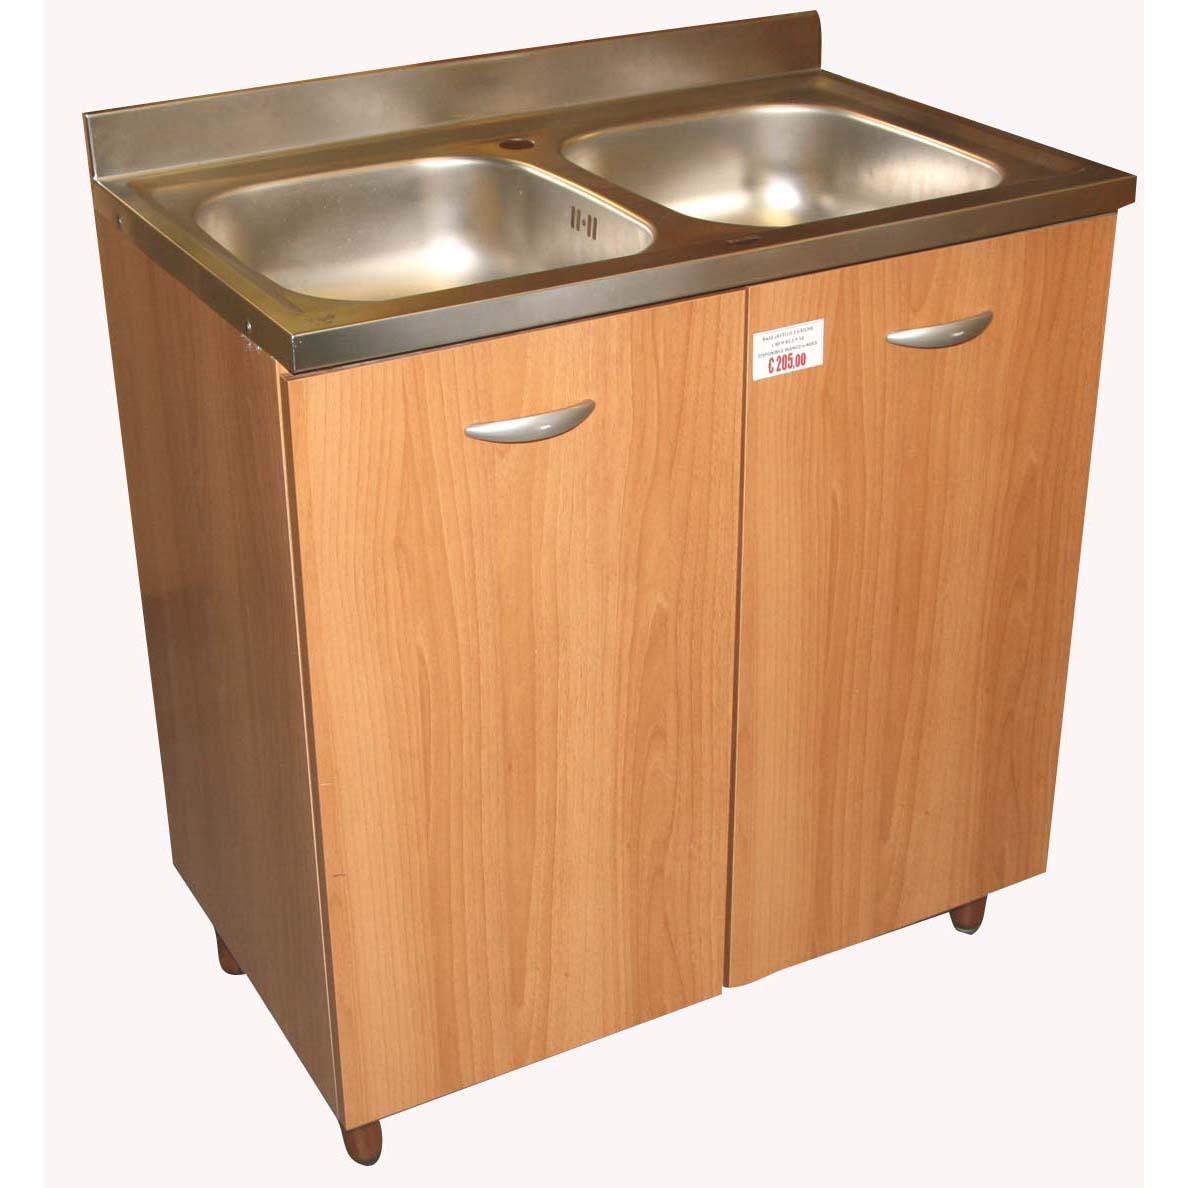 Base sottolavello a due vasche per cucina componibile Easy color ...